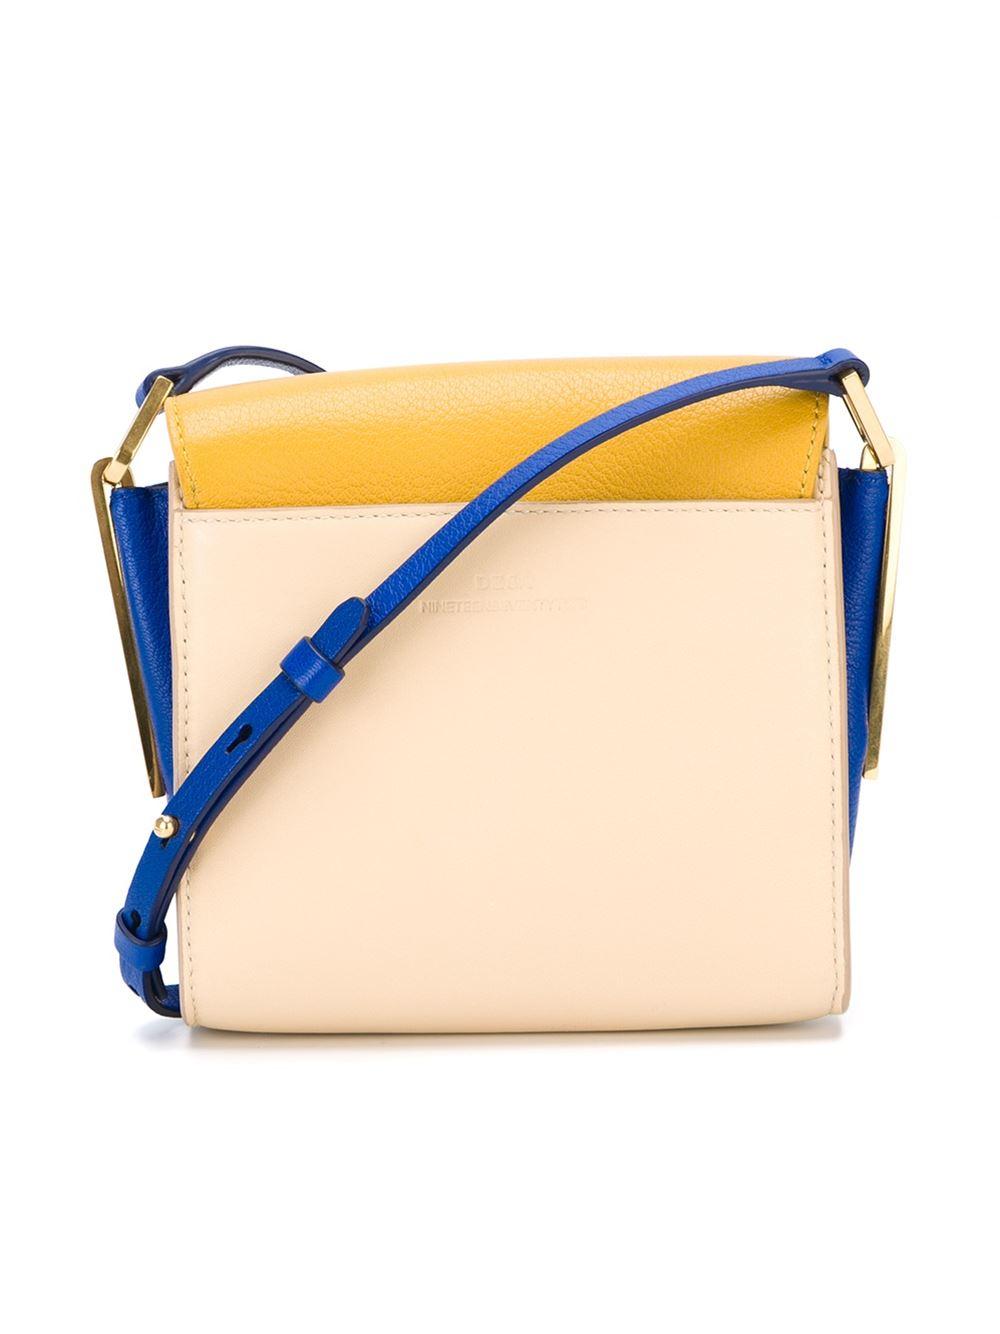 desa 1972 colour block crossbody bag in yellow